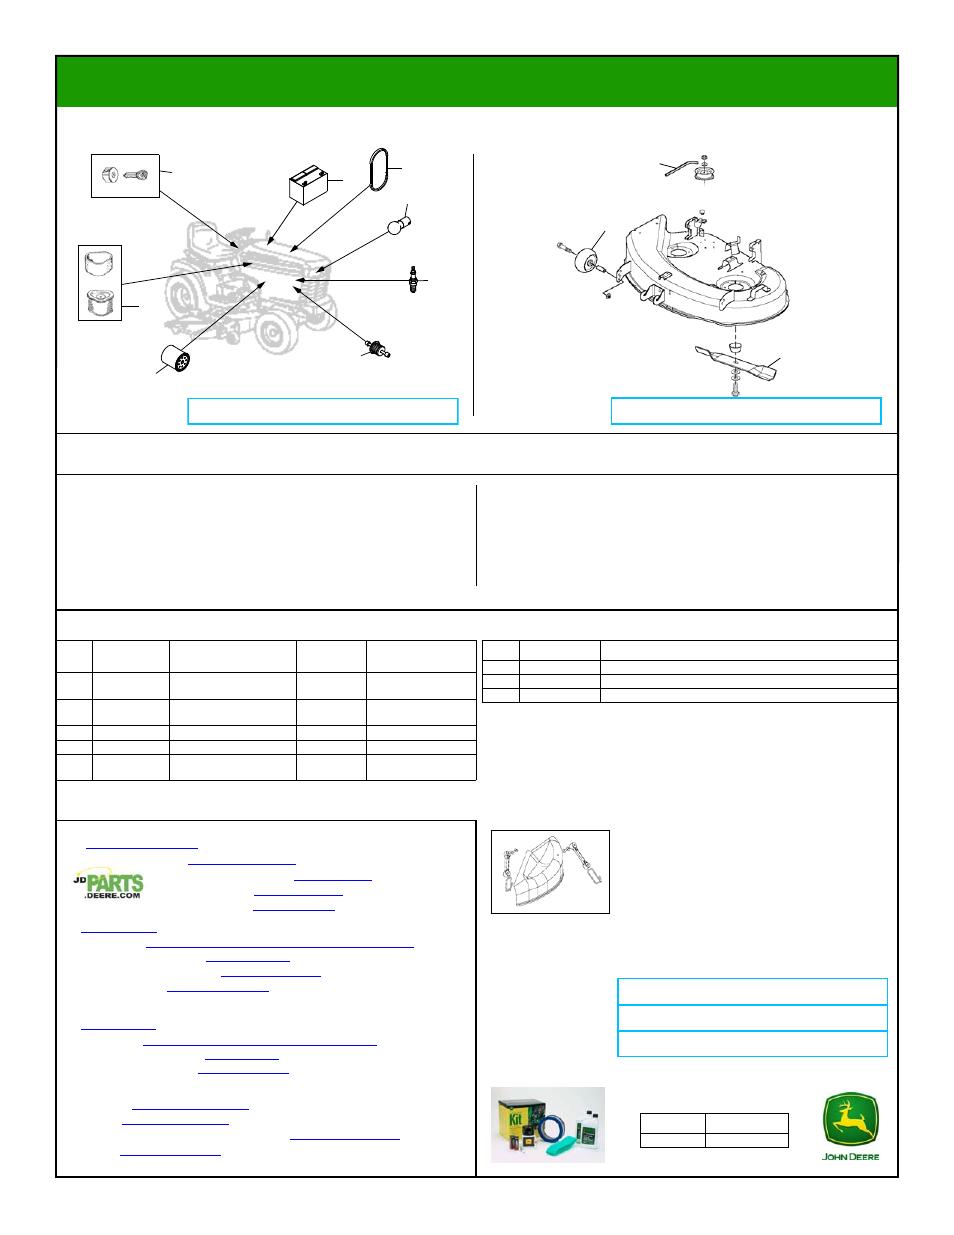 "John Deere LT155 User Manual | 1 page on john deere lt133 electrical schematic, john deere stx38 wiring schematic, john deere lt160 parts manual, john deere lx172 parts schematic, john deere lt160 42"" deck, john deere lx277 parts schematic, john deere parts diagrams, john deere la130 parts schematic, john deere 185 hydro manual, john deere 265 schematic, john deere lx178 parts schematic, deere lt155 harness schematic, john deere l118 problems, john deere 110 parts schematic, john deere l130 parts schematic, john deere f935 schematics, john deere parts catalog online, john deere lx178 parts list, john deere lt160 parts list, john deere gt235 parts manual,"